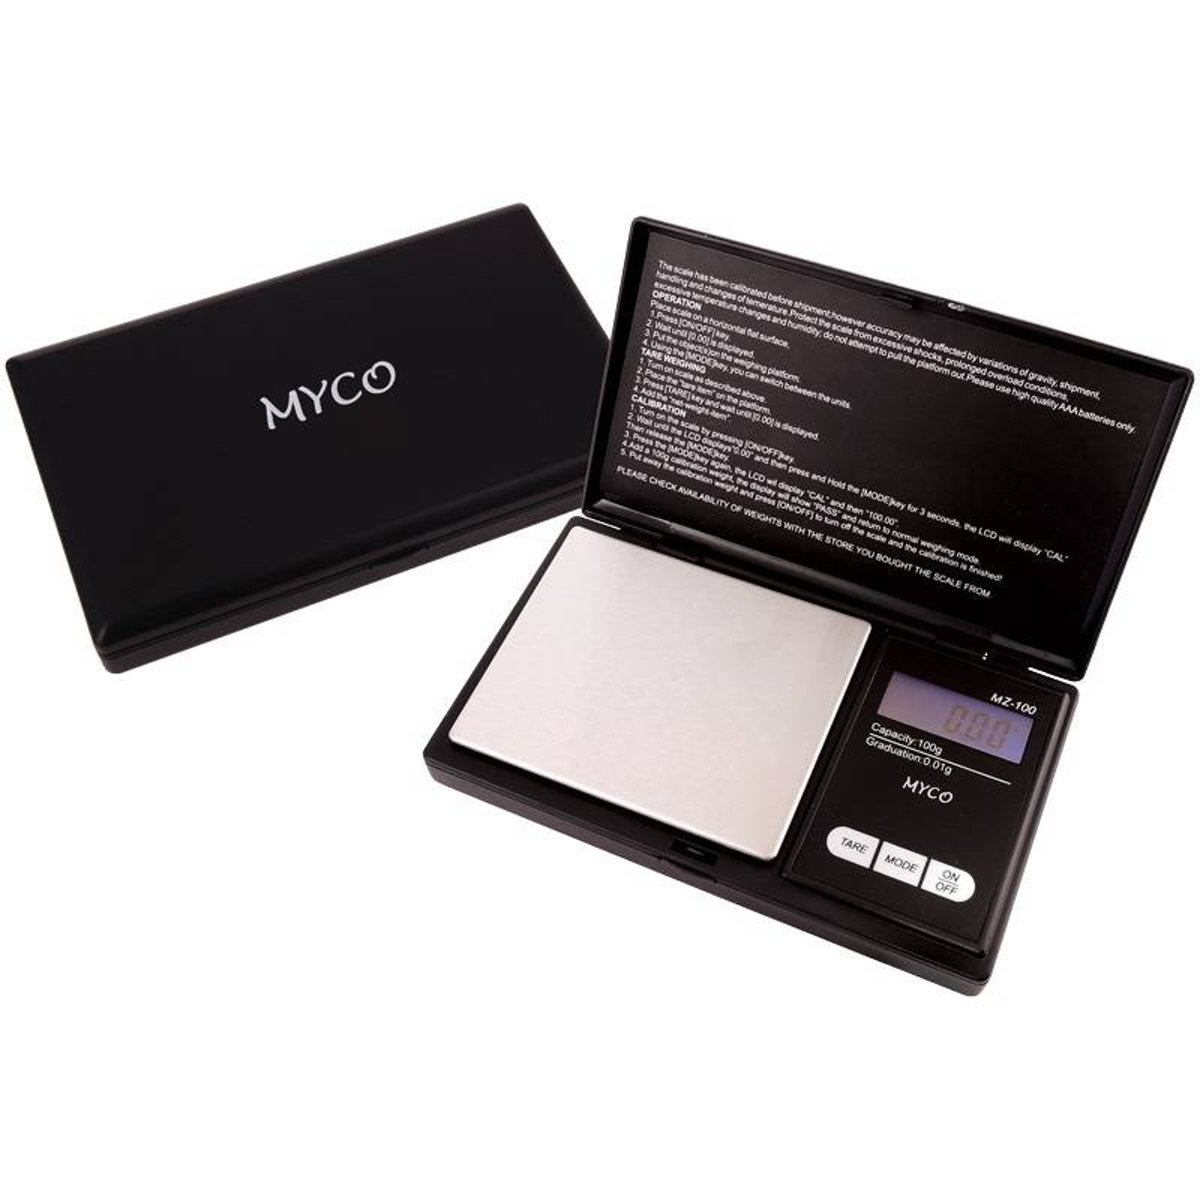 MYCO Professionele precisie weegschaal 0.01 gram nauwkeurig tot 100 gram